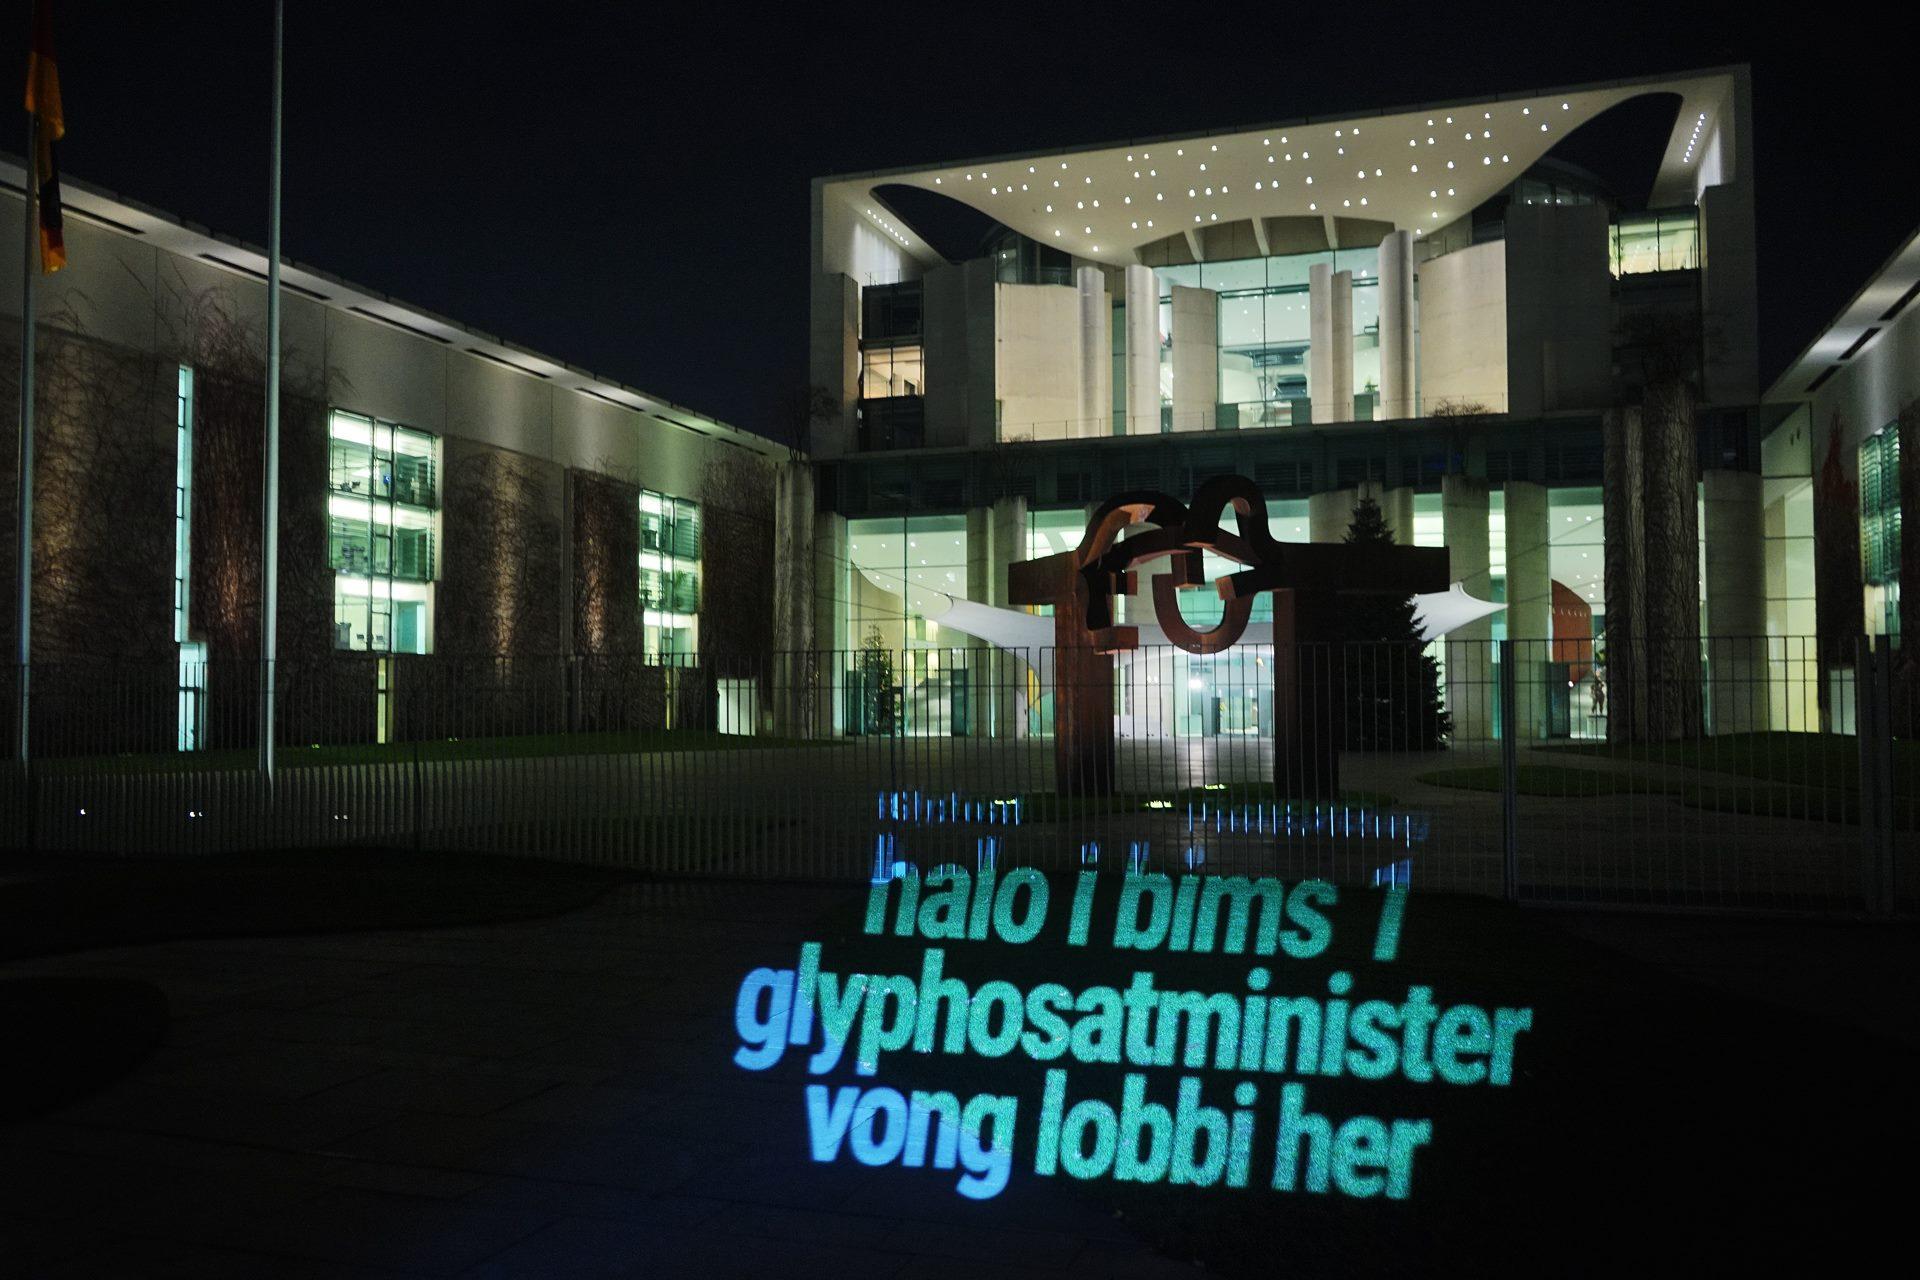 glyphosat-minister-2